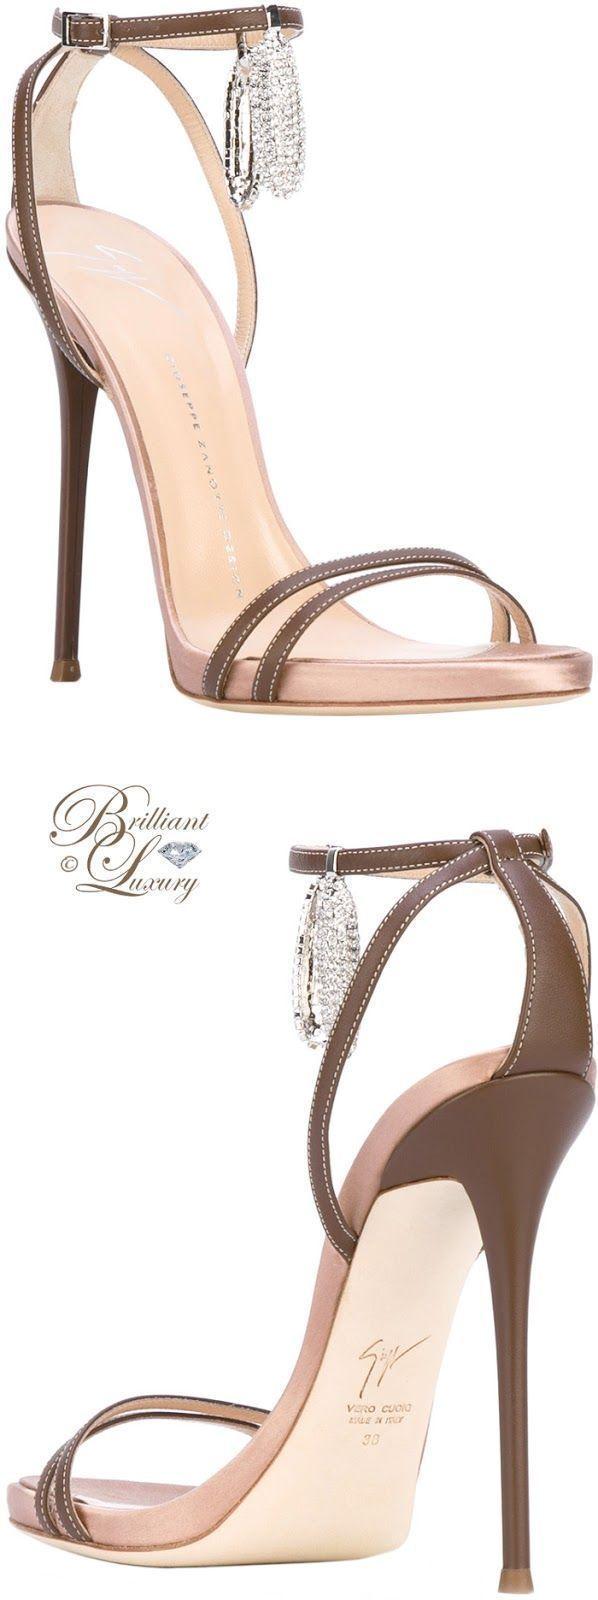 Brilliant Luxury By Emmy De Giuseppe Zanotti Ankle Charm Sandals Zanotti Giuseppezanottiheelssandals Heels Sandals Heels High Heel Sandals